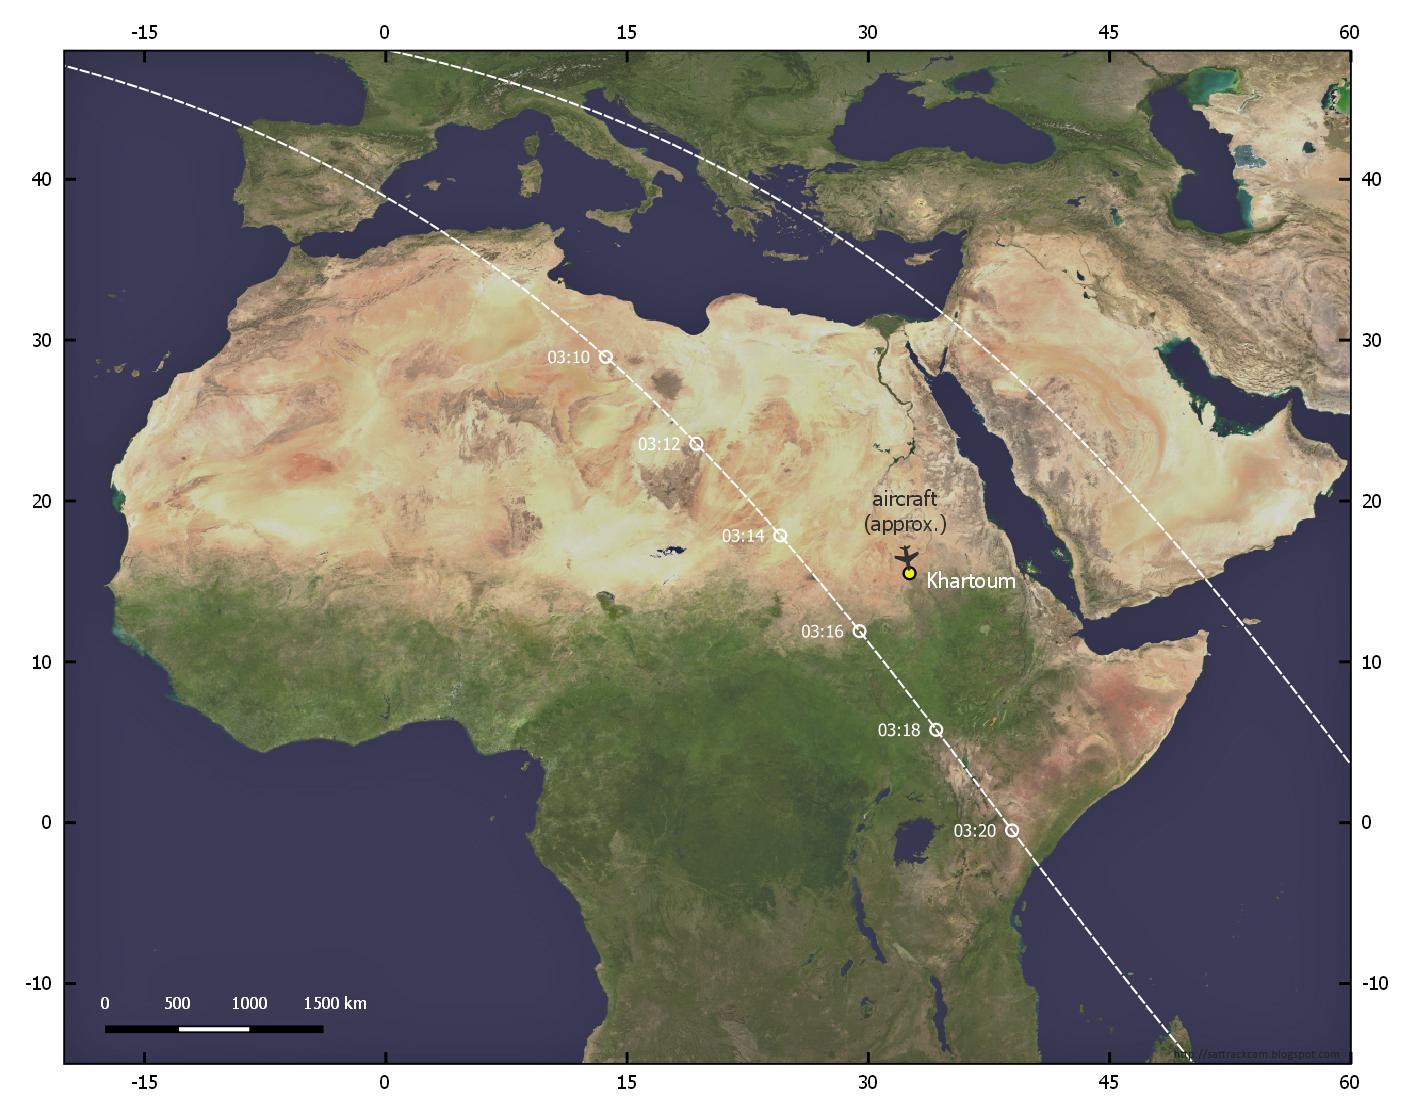 https://1.bp.blogspot.com/-elGiU7xaxpY/WlStxGlmMiI/AAAAAAAAE1M/A29OdVYjkIYsFe6xv2daFK4JzhSUy0ZbACLcBGAs/s1600/NROL_47_Falcon9_trajectenkaart_150dpi_Africadetail_anot.jpg